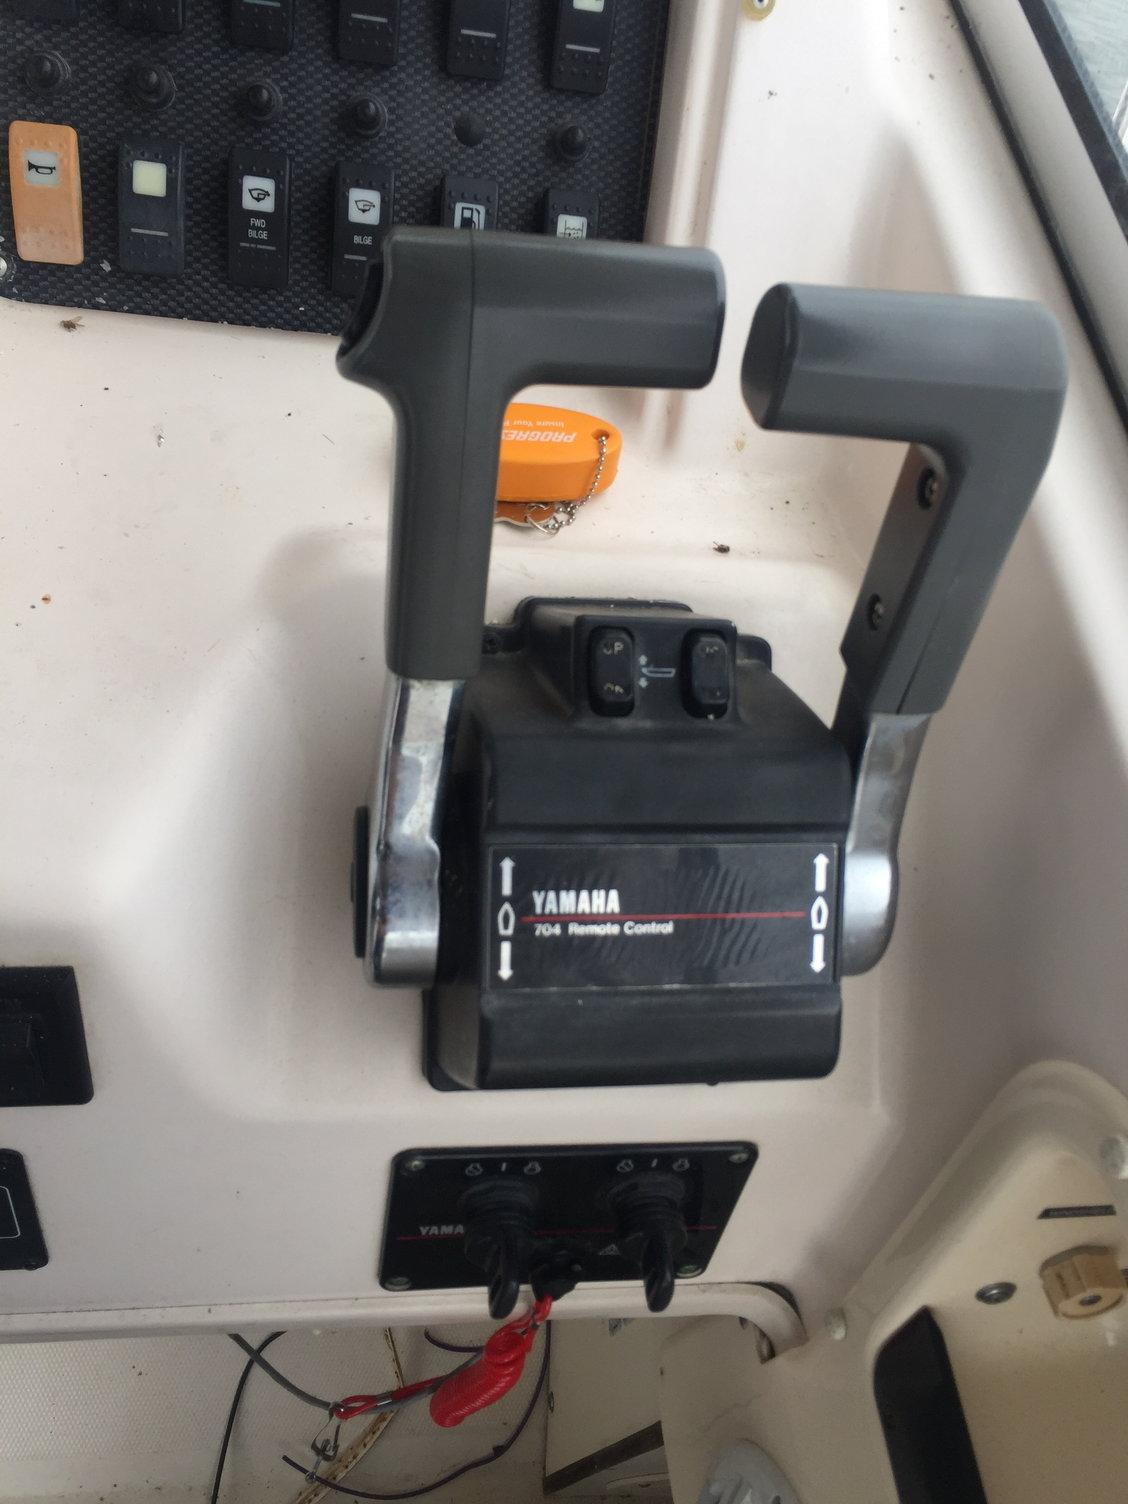 Yamaha 704 Remote Control Manual Quicksilver Trim Wiring ... on